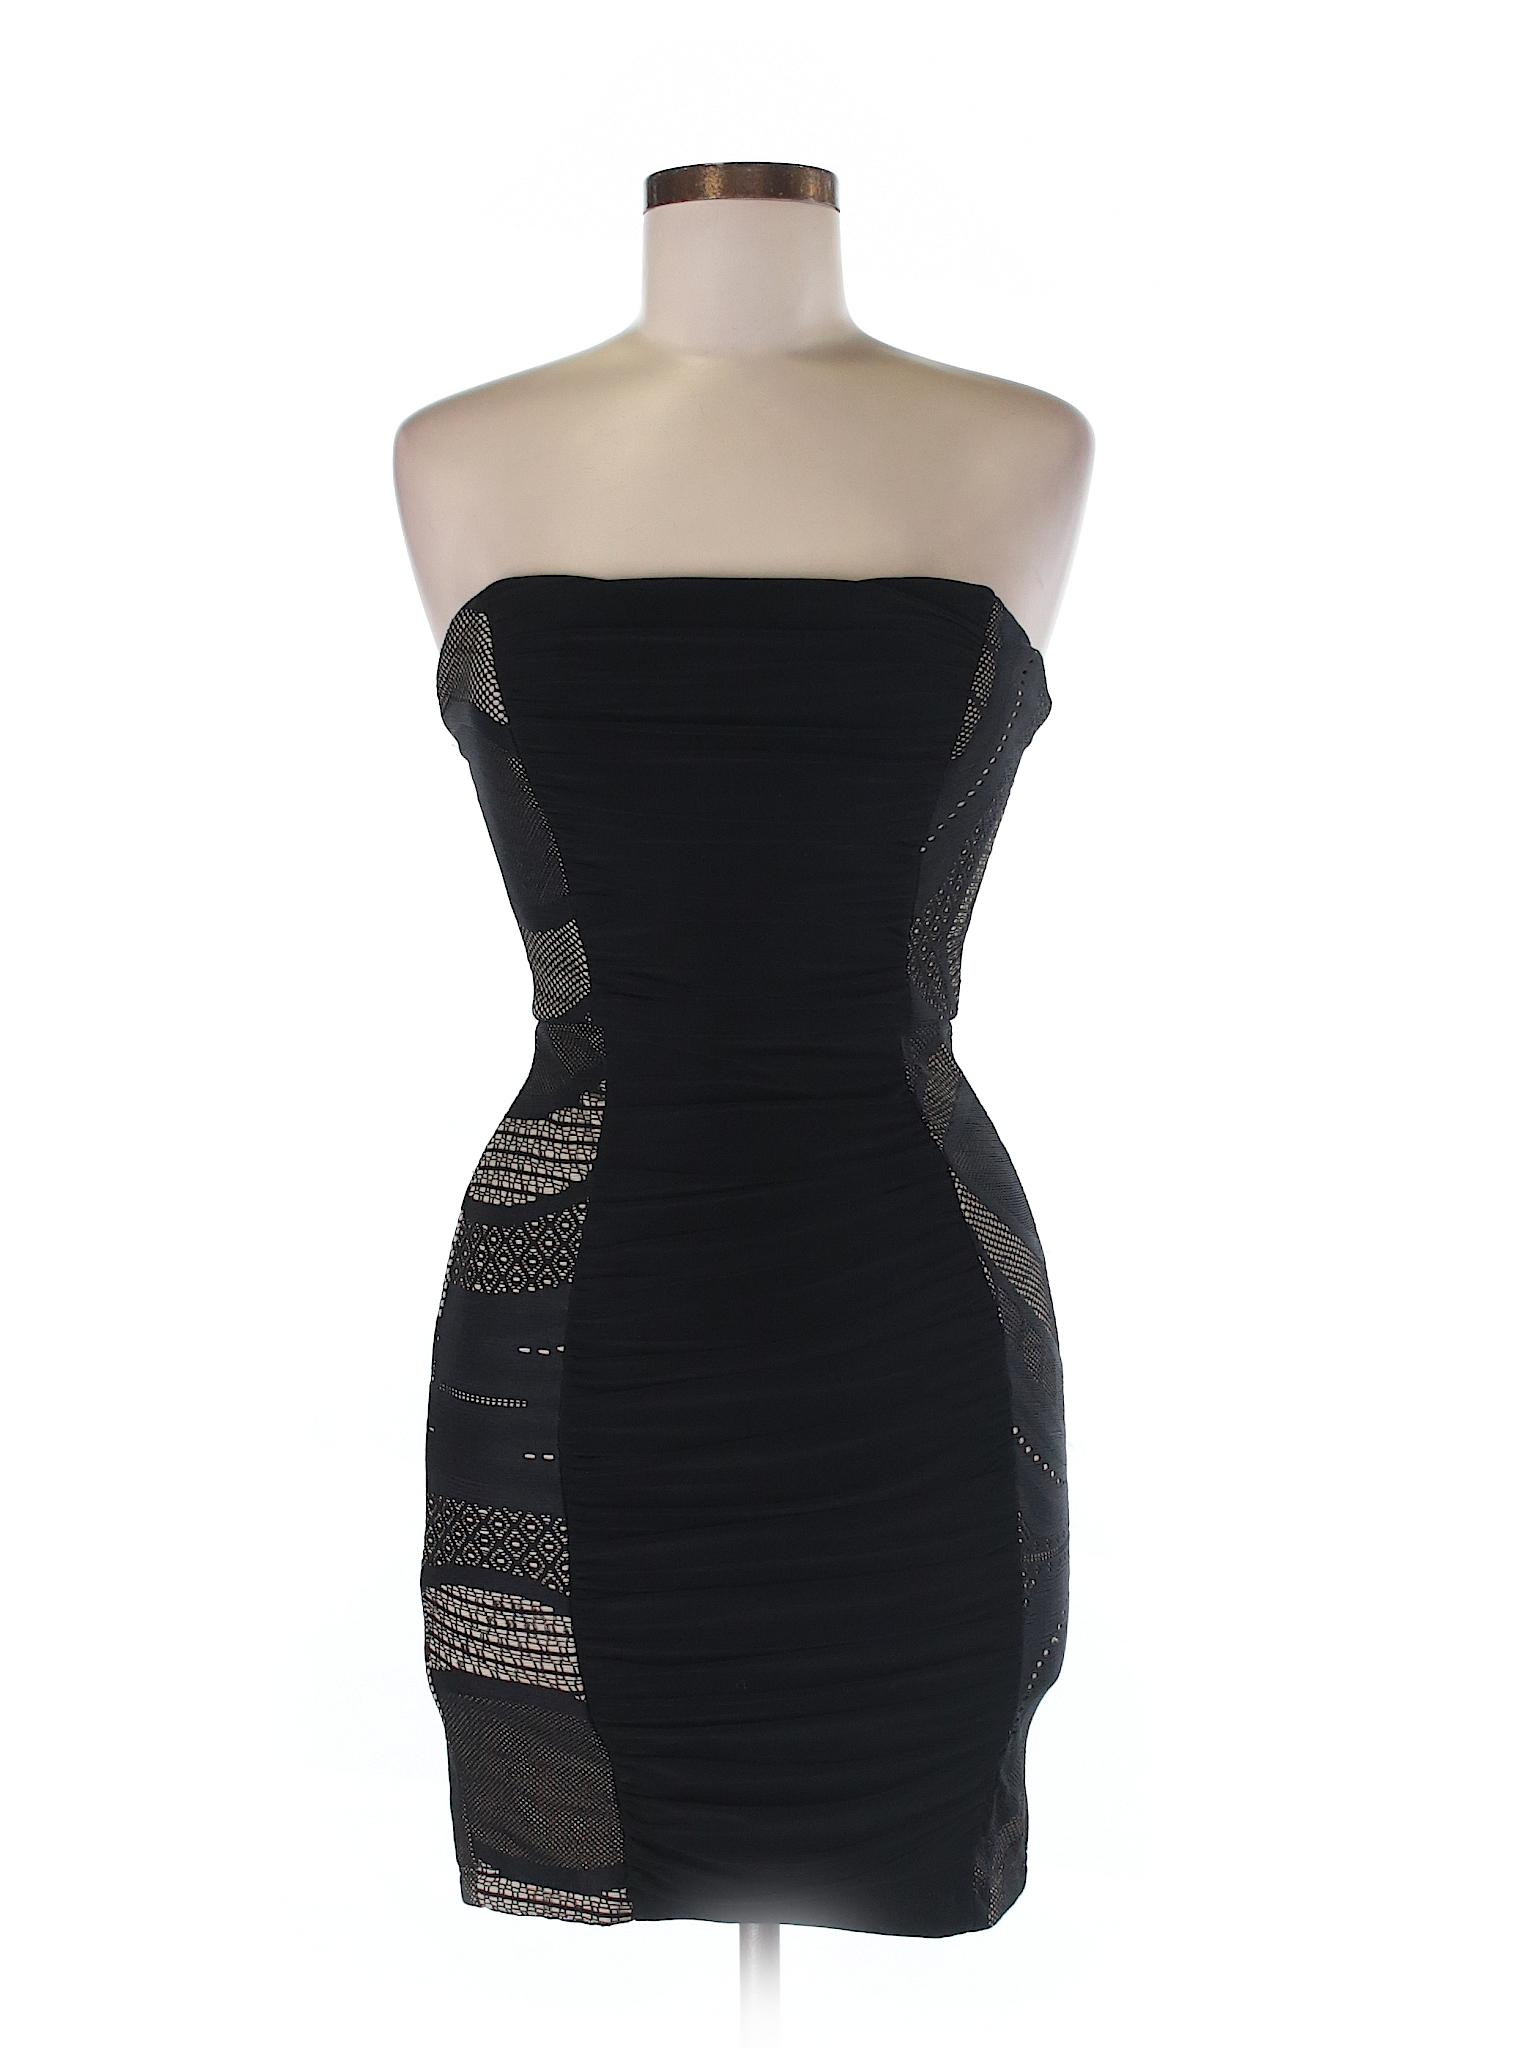 Selling Mystic Selling Casual Casual Dress Dress Mystic zOqrdAzf